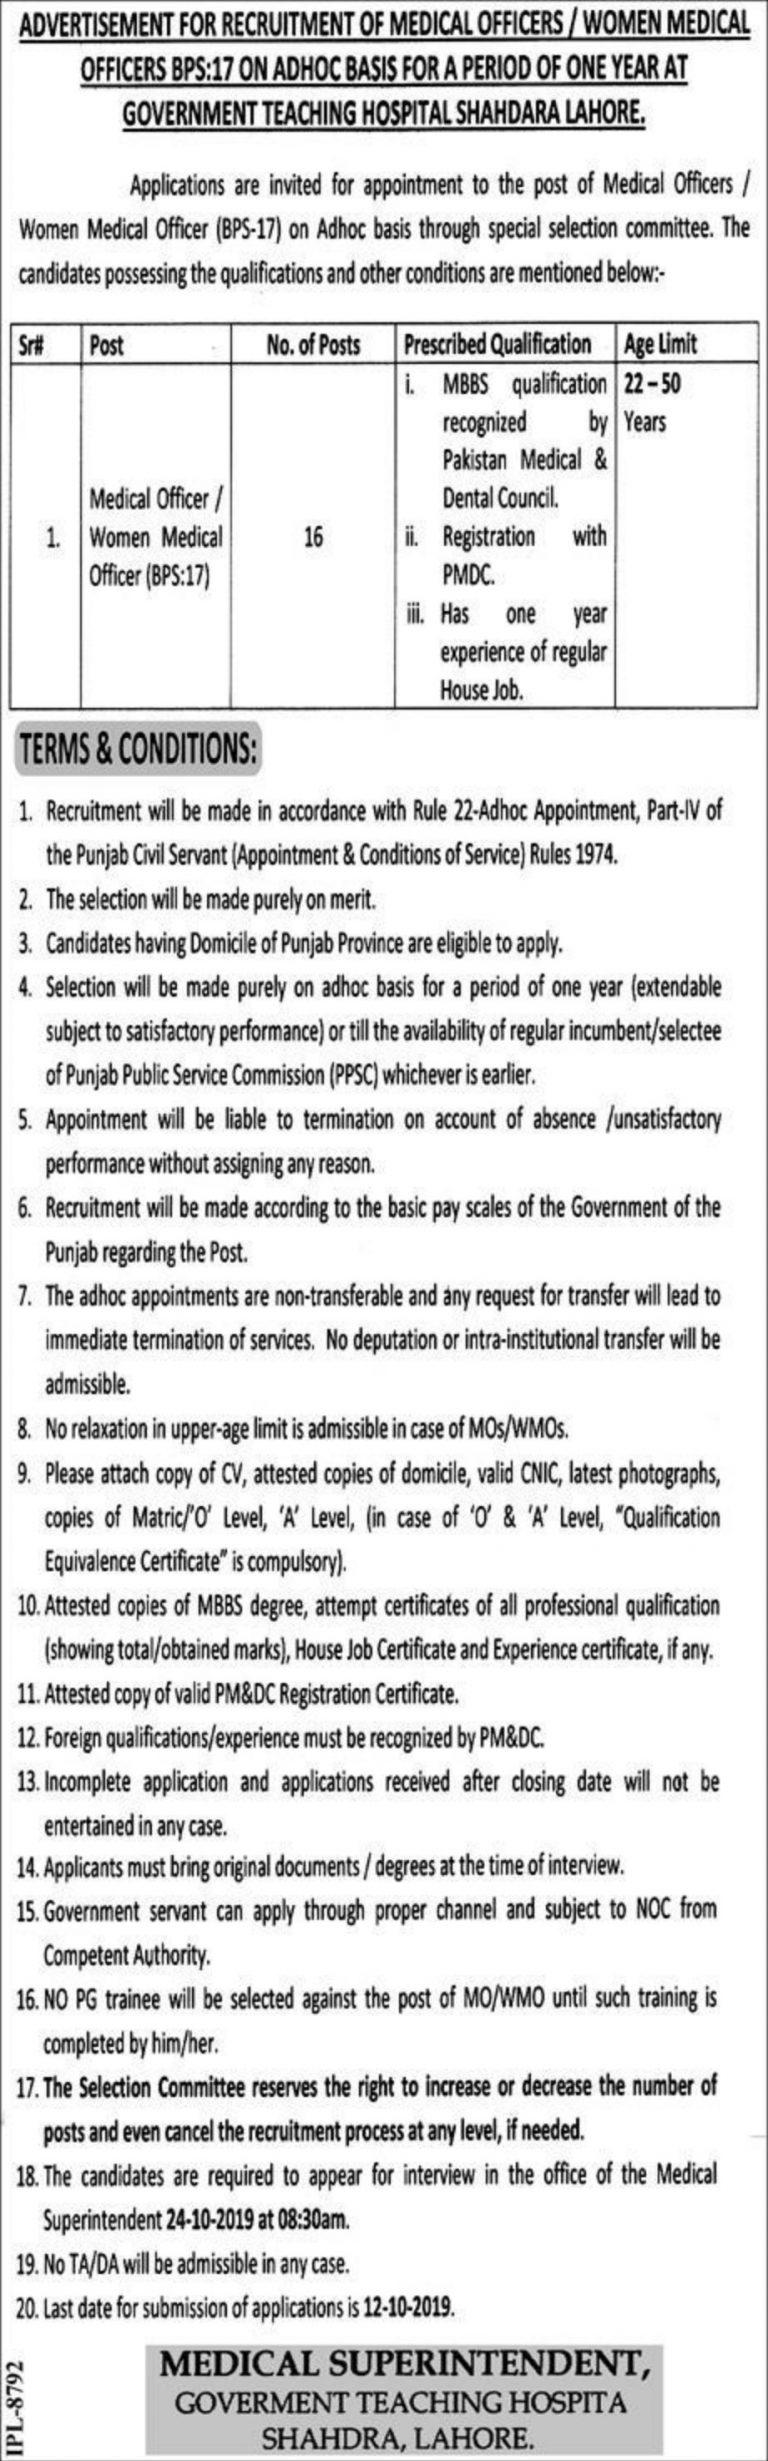 Govt Teaching Hospital Shahdara Lahore Jobs 2019 Punjab Test & Interview Date